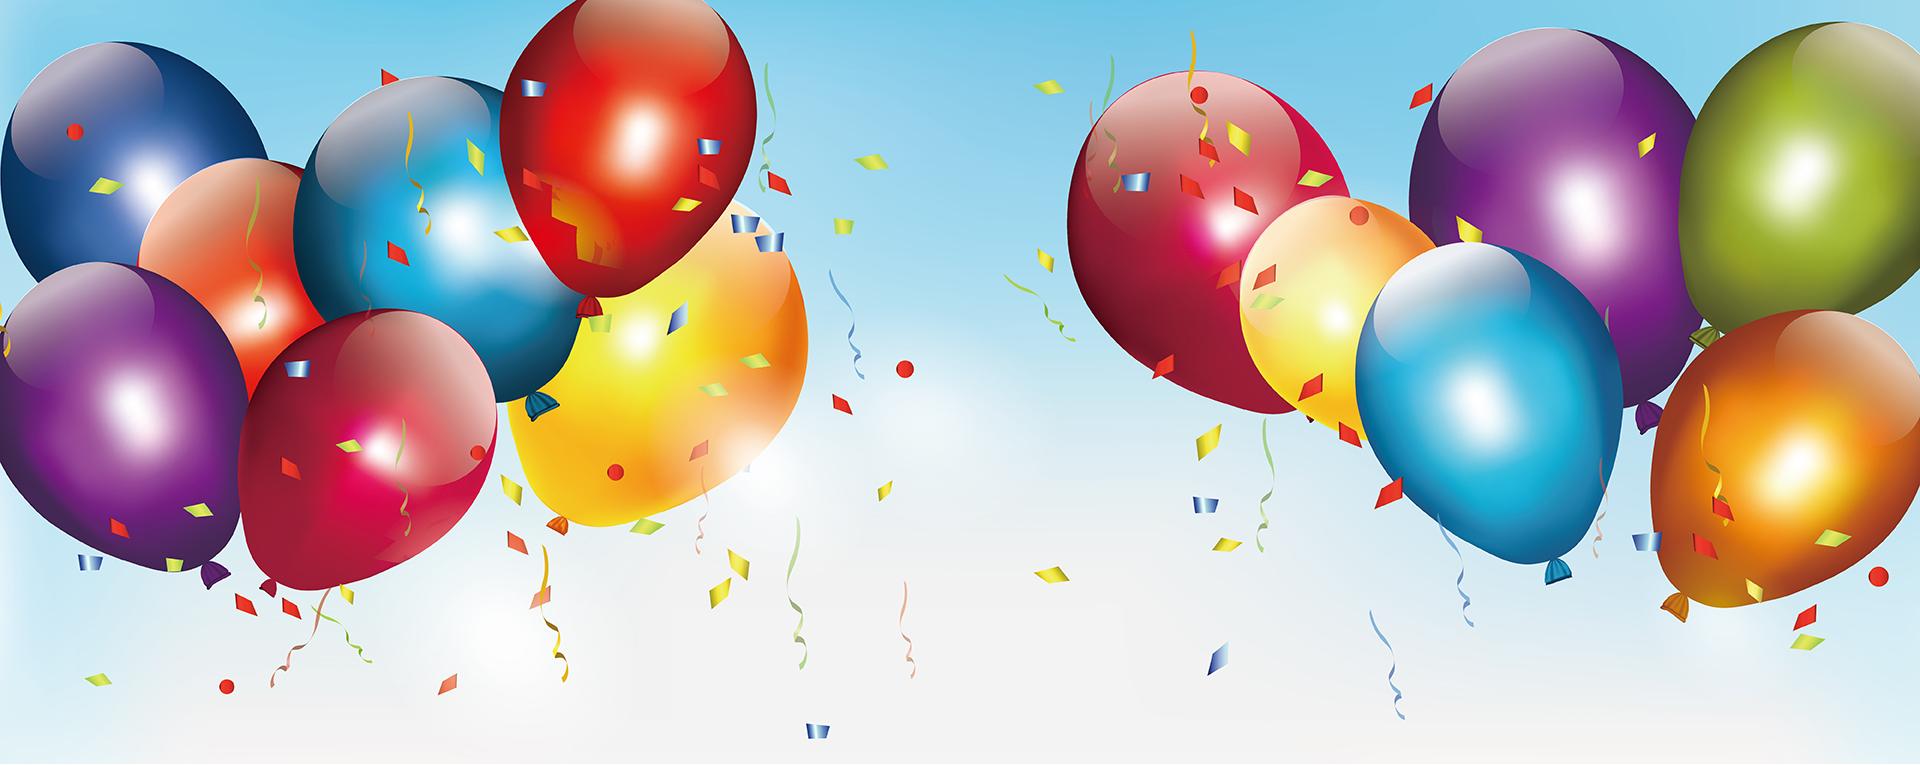 hd background balloon carnival atmosphere  balloon  sky